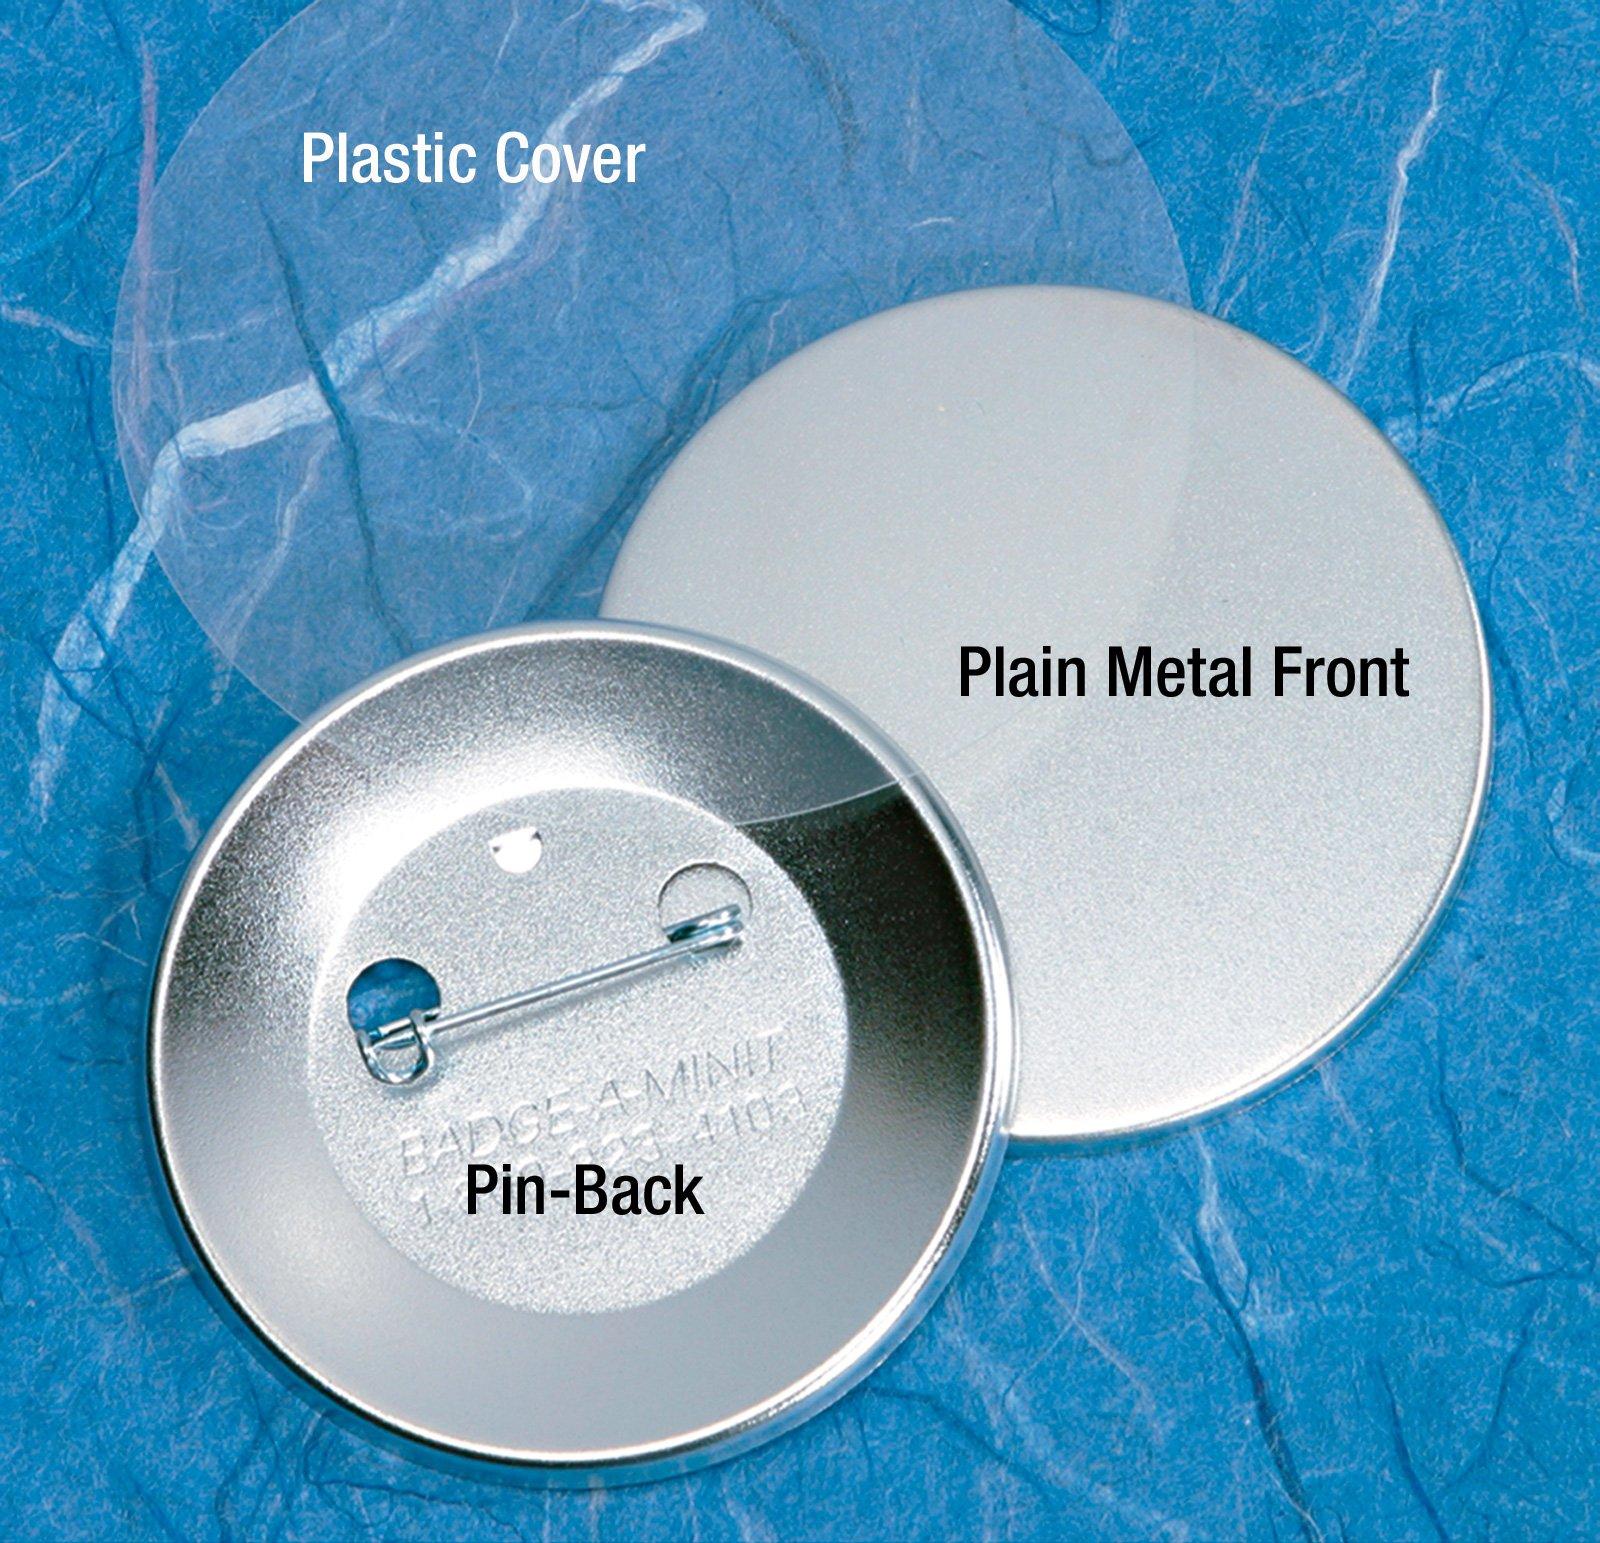 Badge-A-Minit 3011-E 2 1/4'' Genuine Badge-A-Minit Pin-Back Button Sets - 500 sets